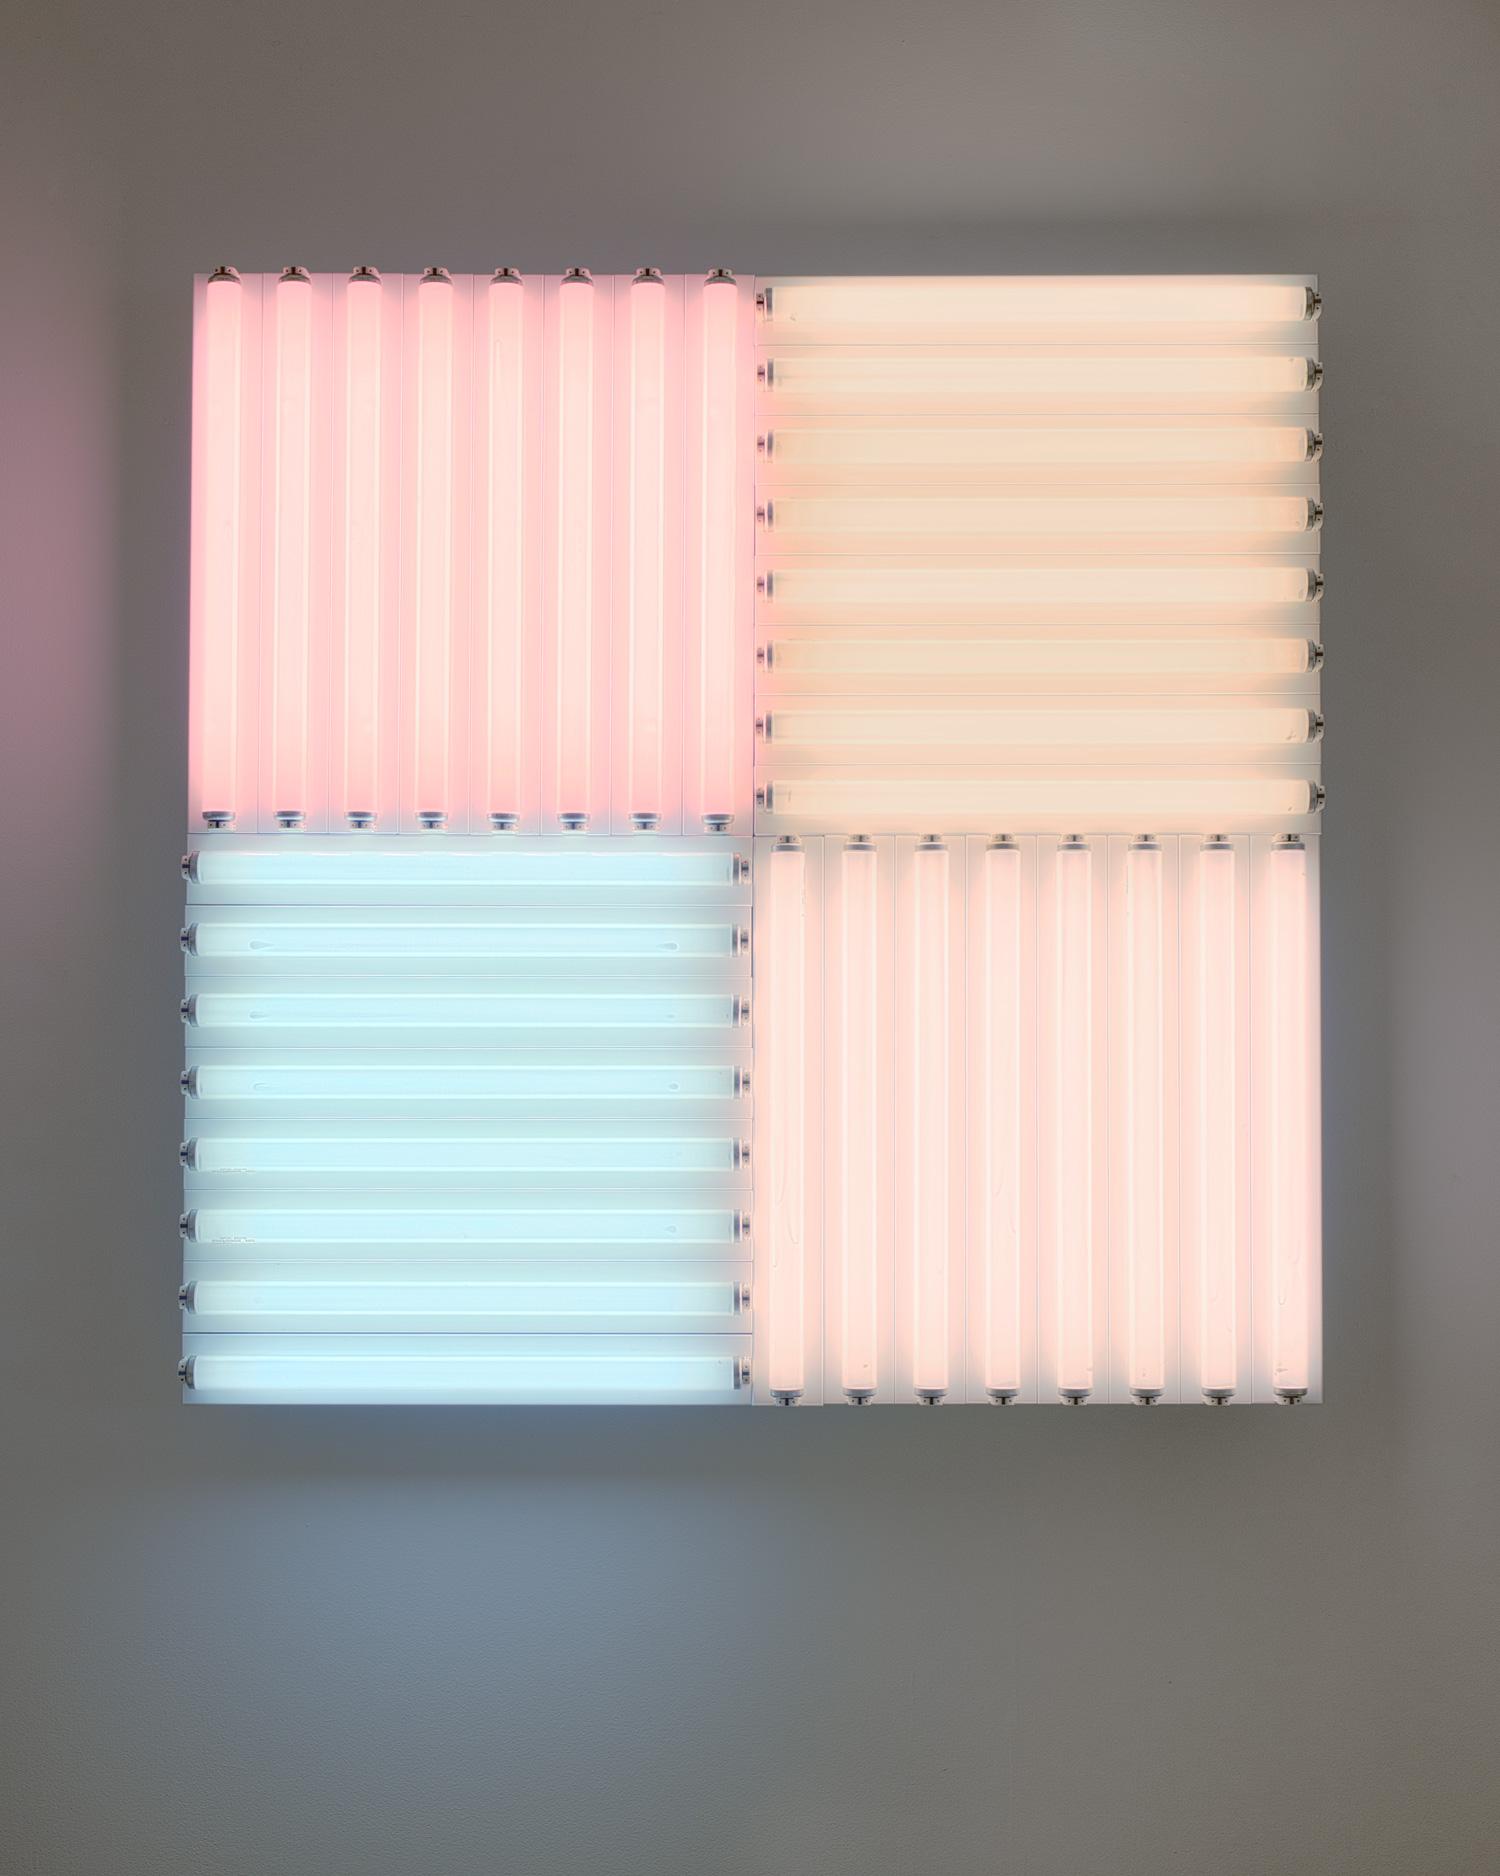 light-squares-warm.jpg